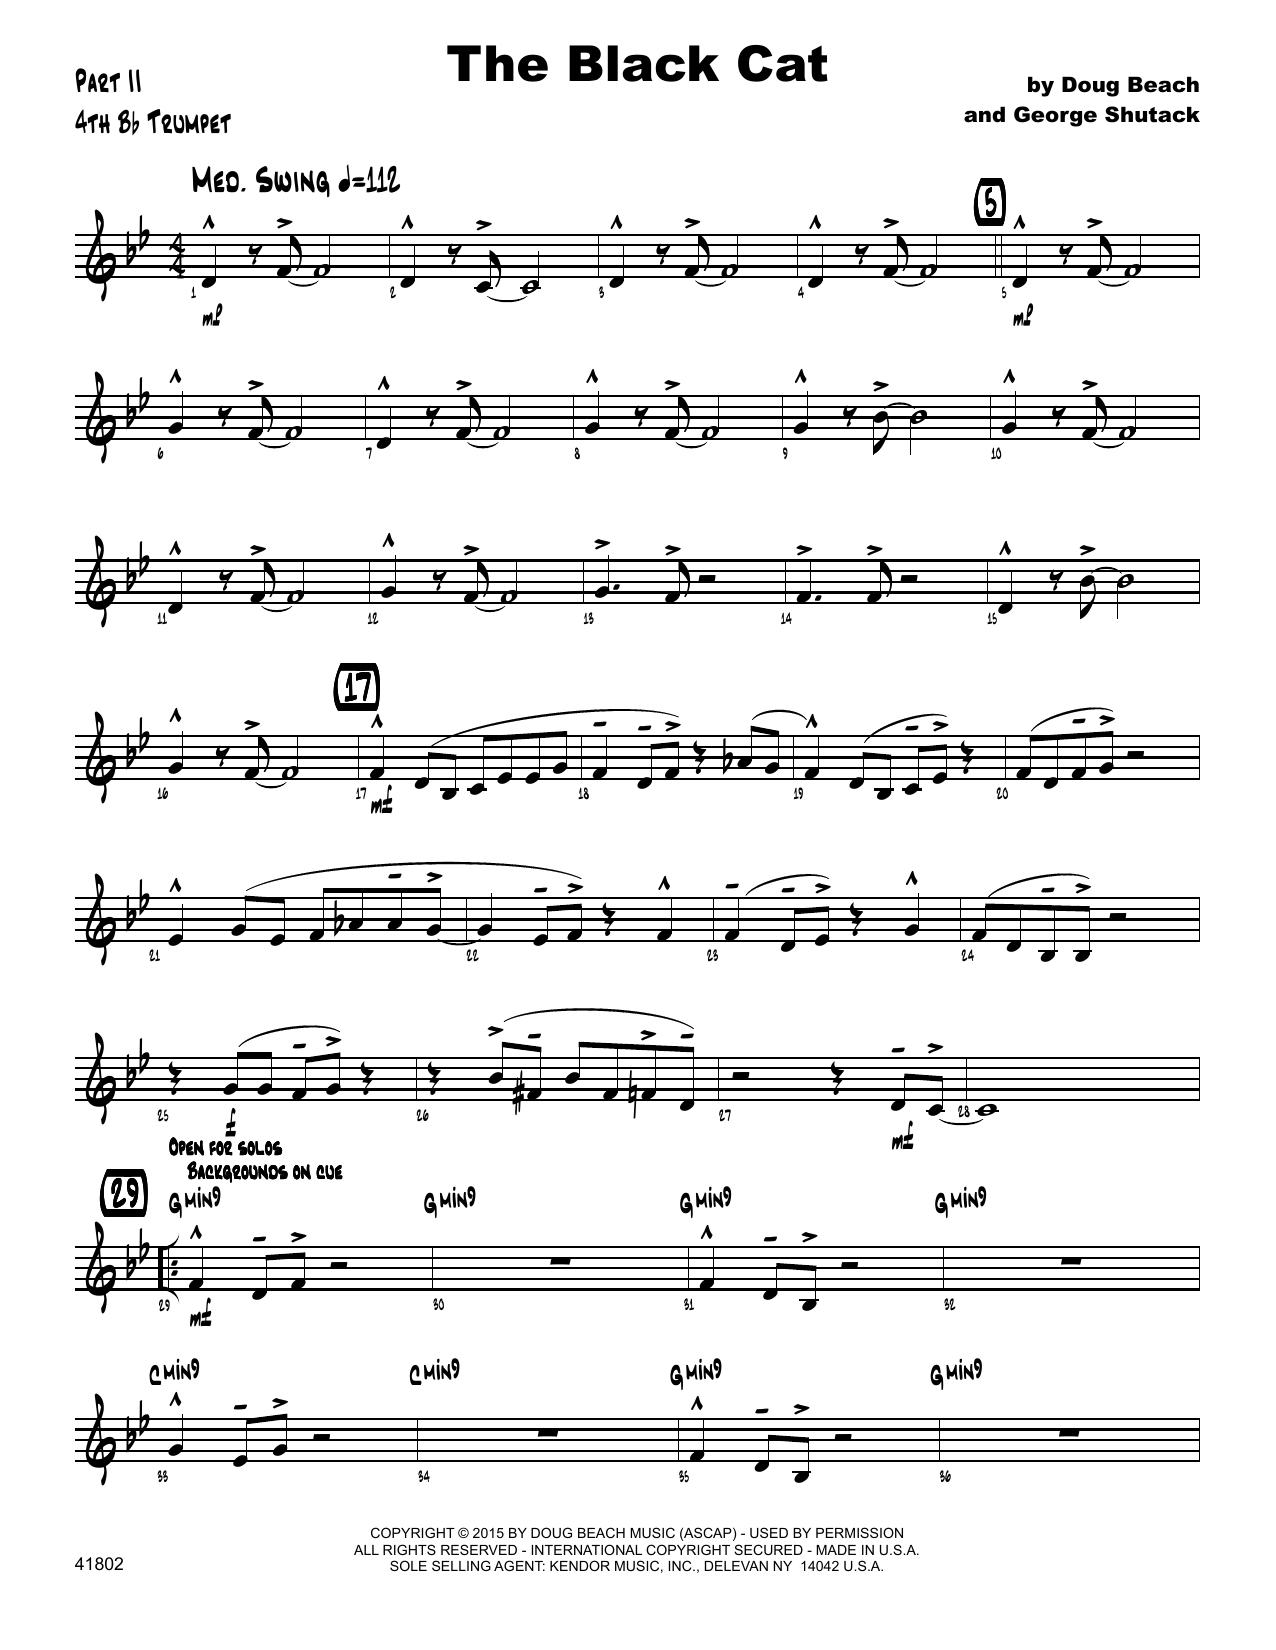 George Shutack - The Black Cat - 4th Bb Trumpet